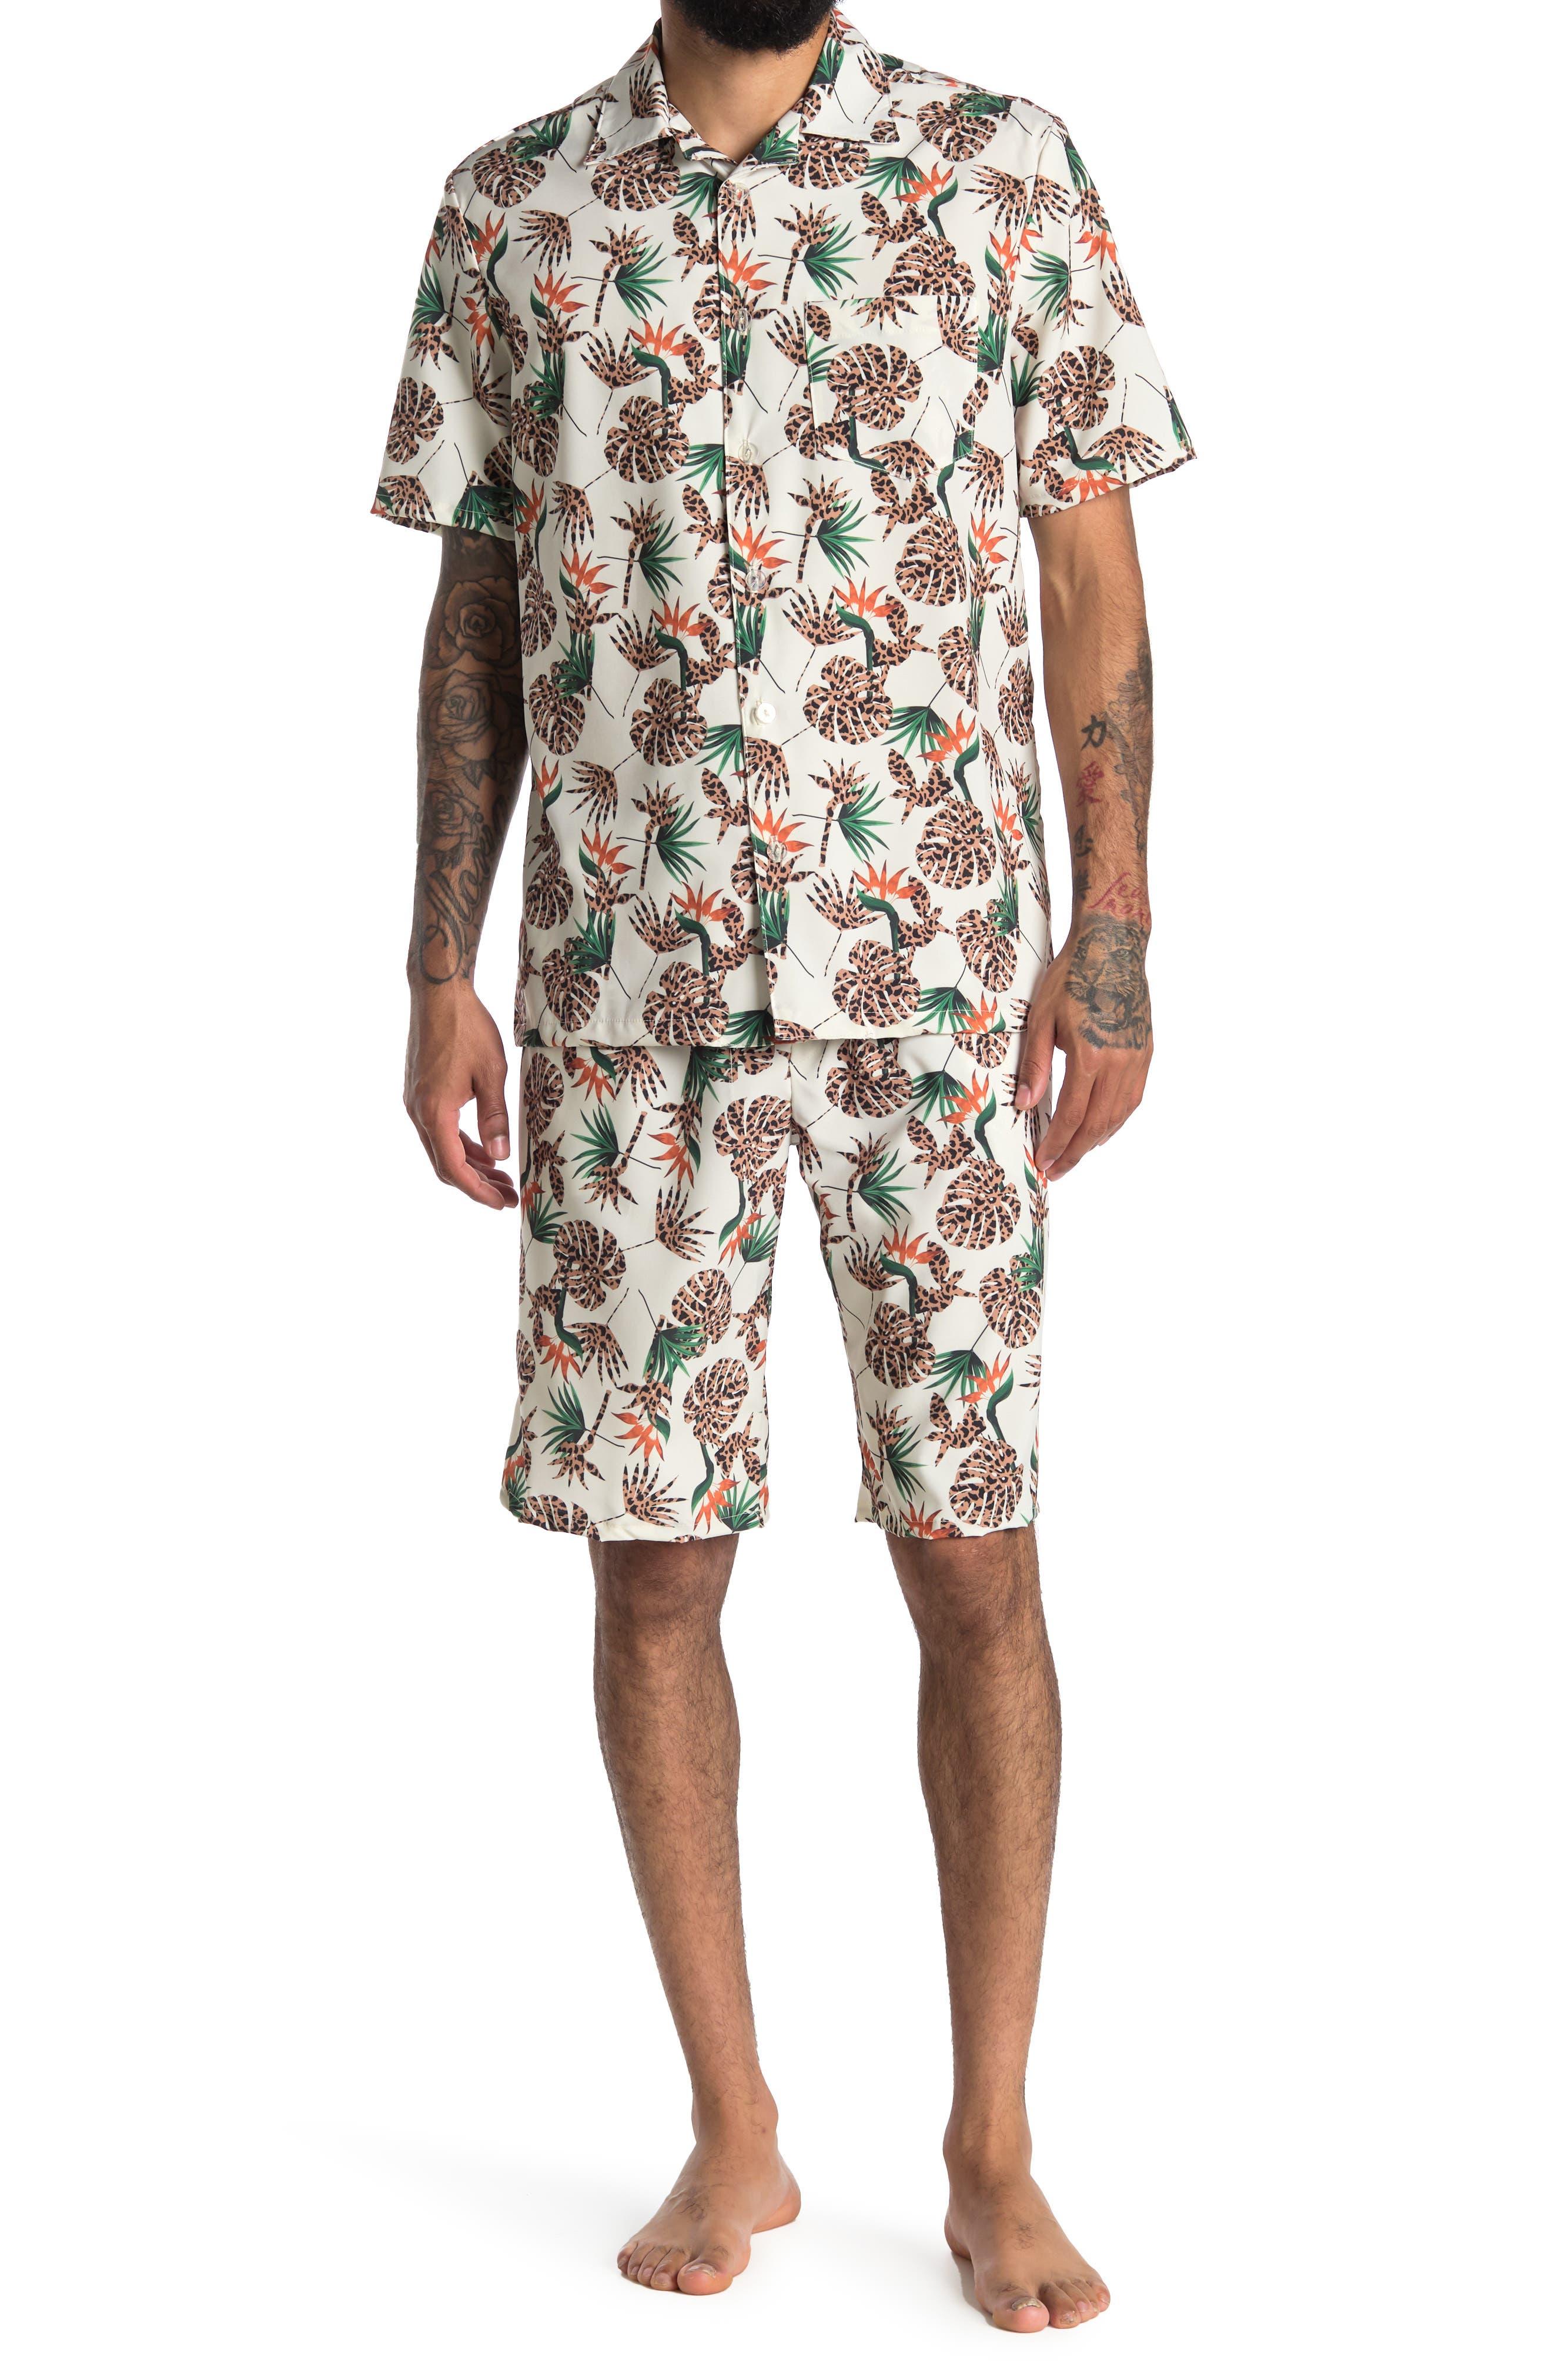 Image of COZY ROZY Tropicana Shirt & Shorts 2-Piece Set